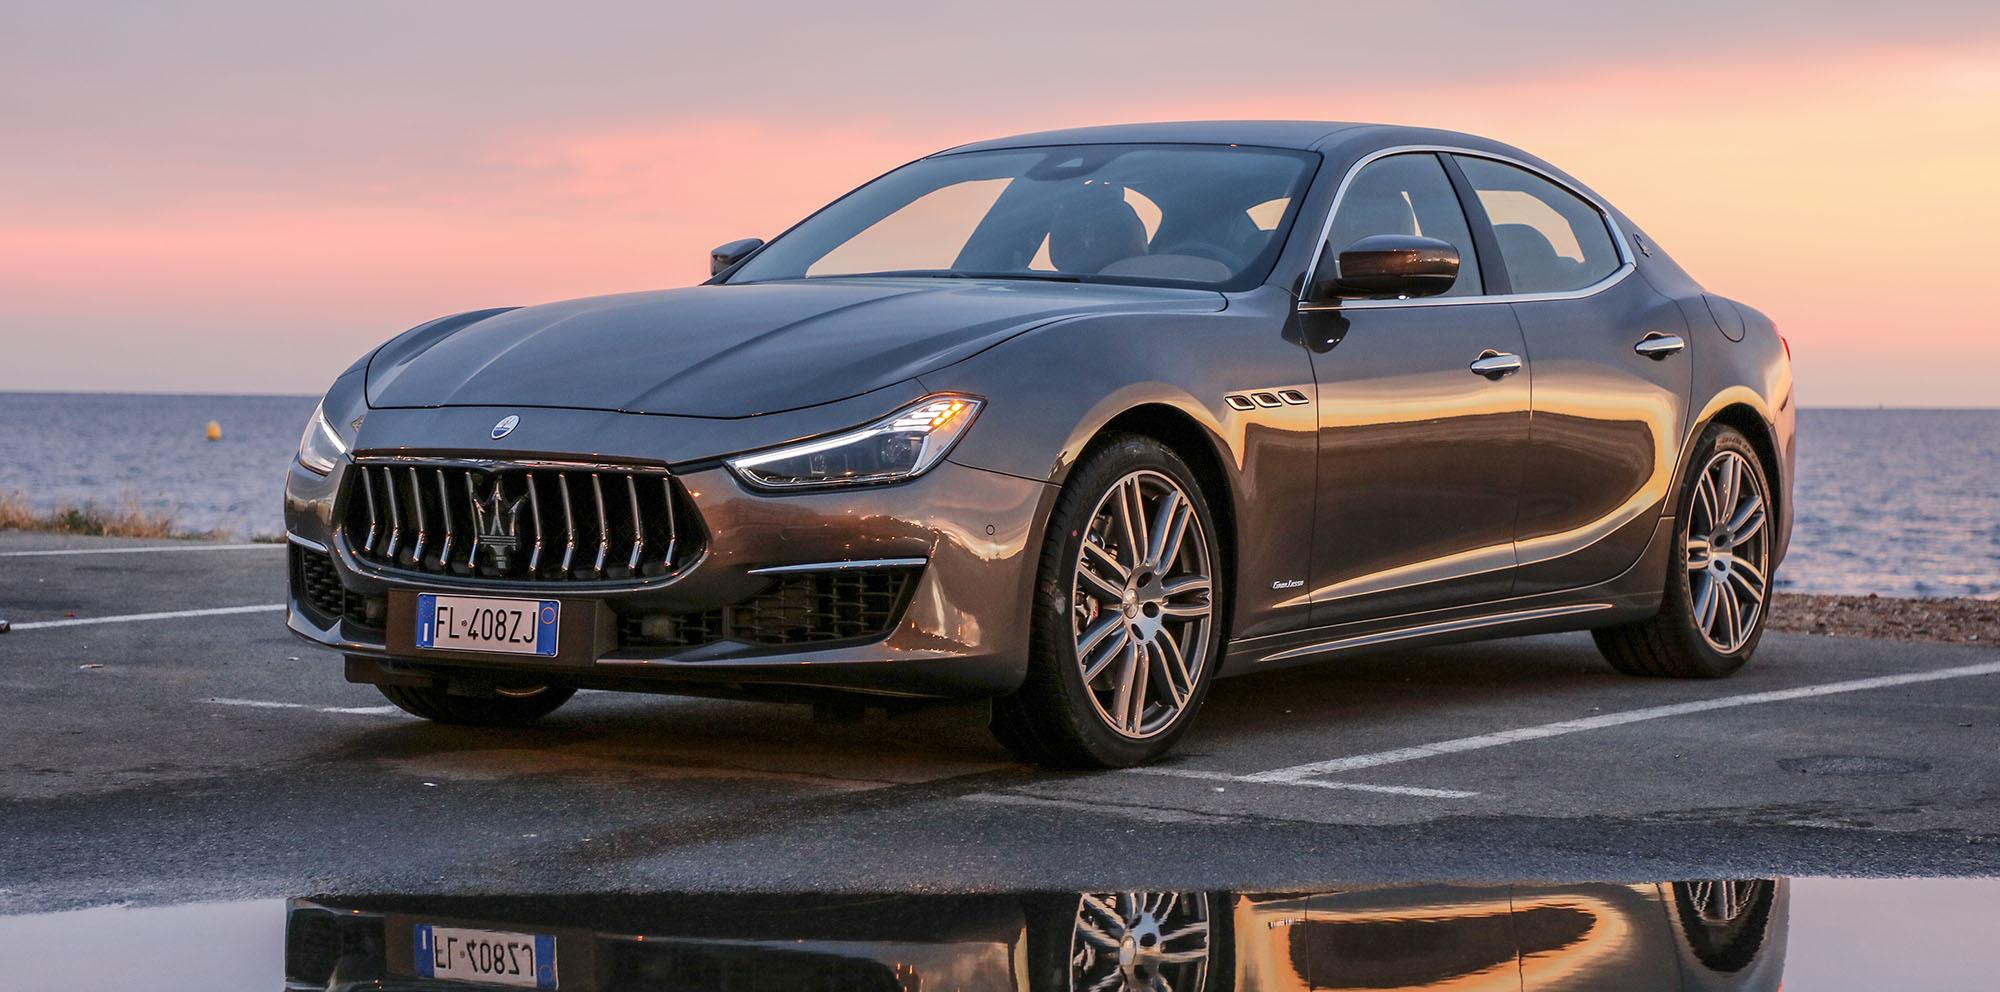 Maserati Ghibli Price >> 2018 Maserati Ghibli Pricing And Specifications Caradvice